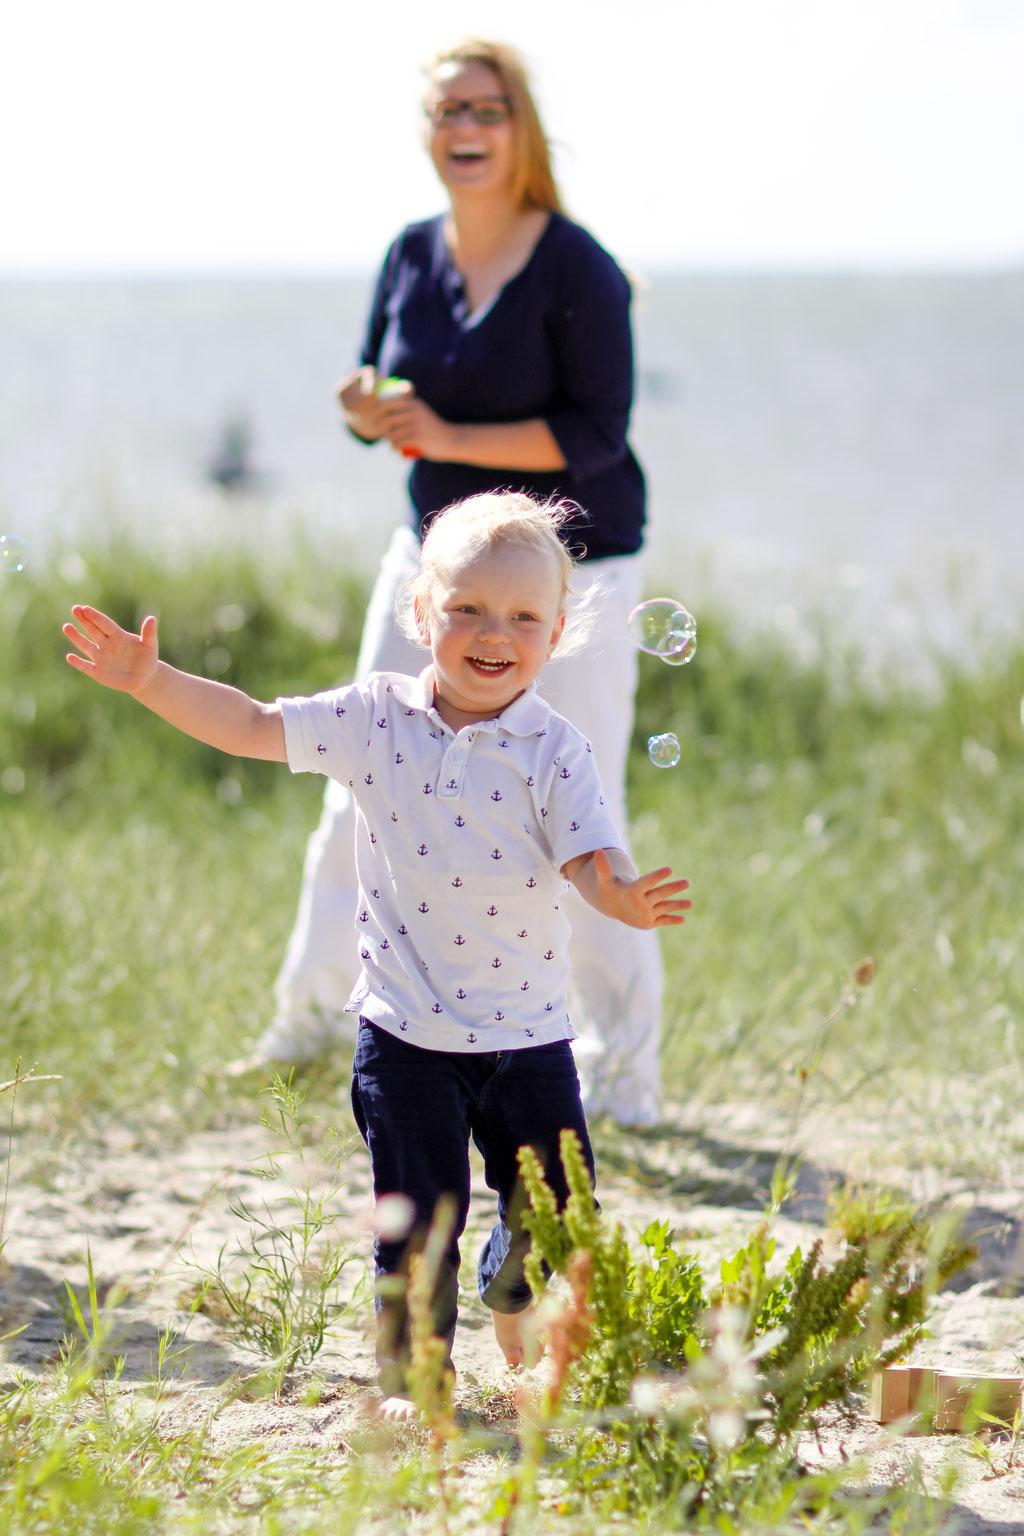 Familie  Mutter und Kind  Kinder  Greifwald  Hendrikje Richert Fotografie